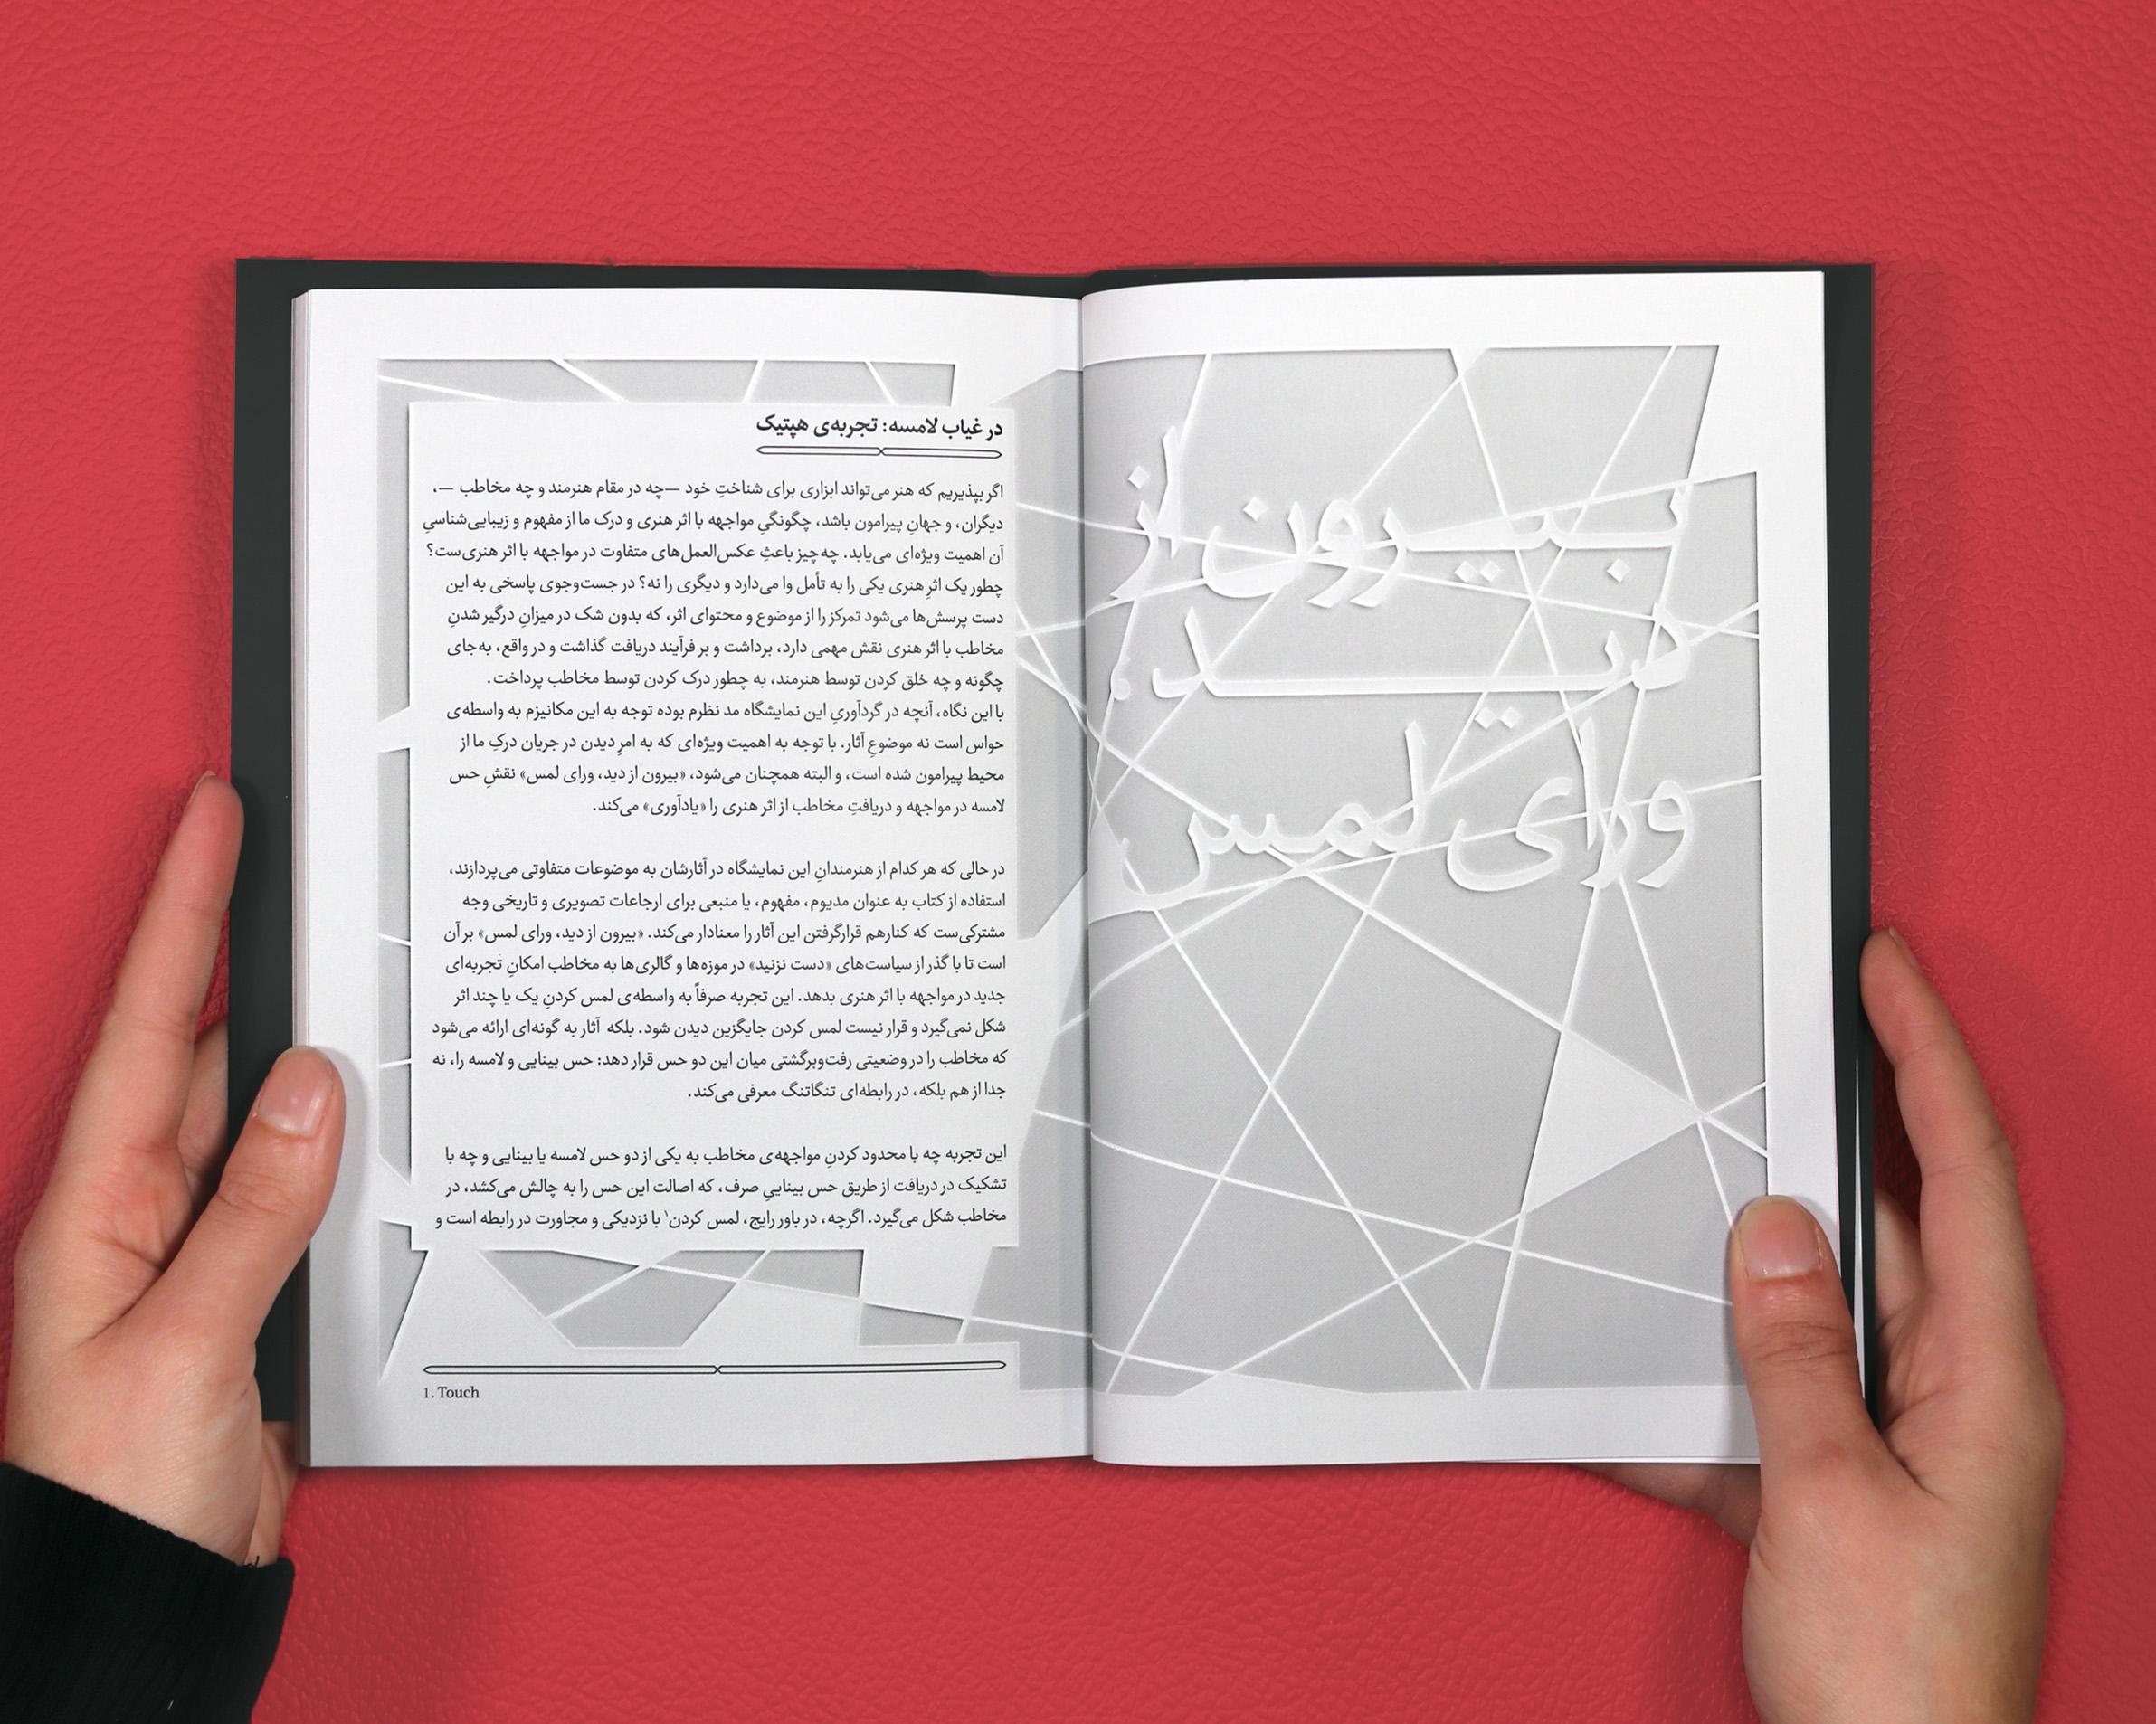 book open to spread of essay